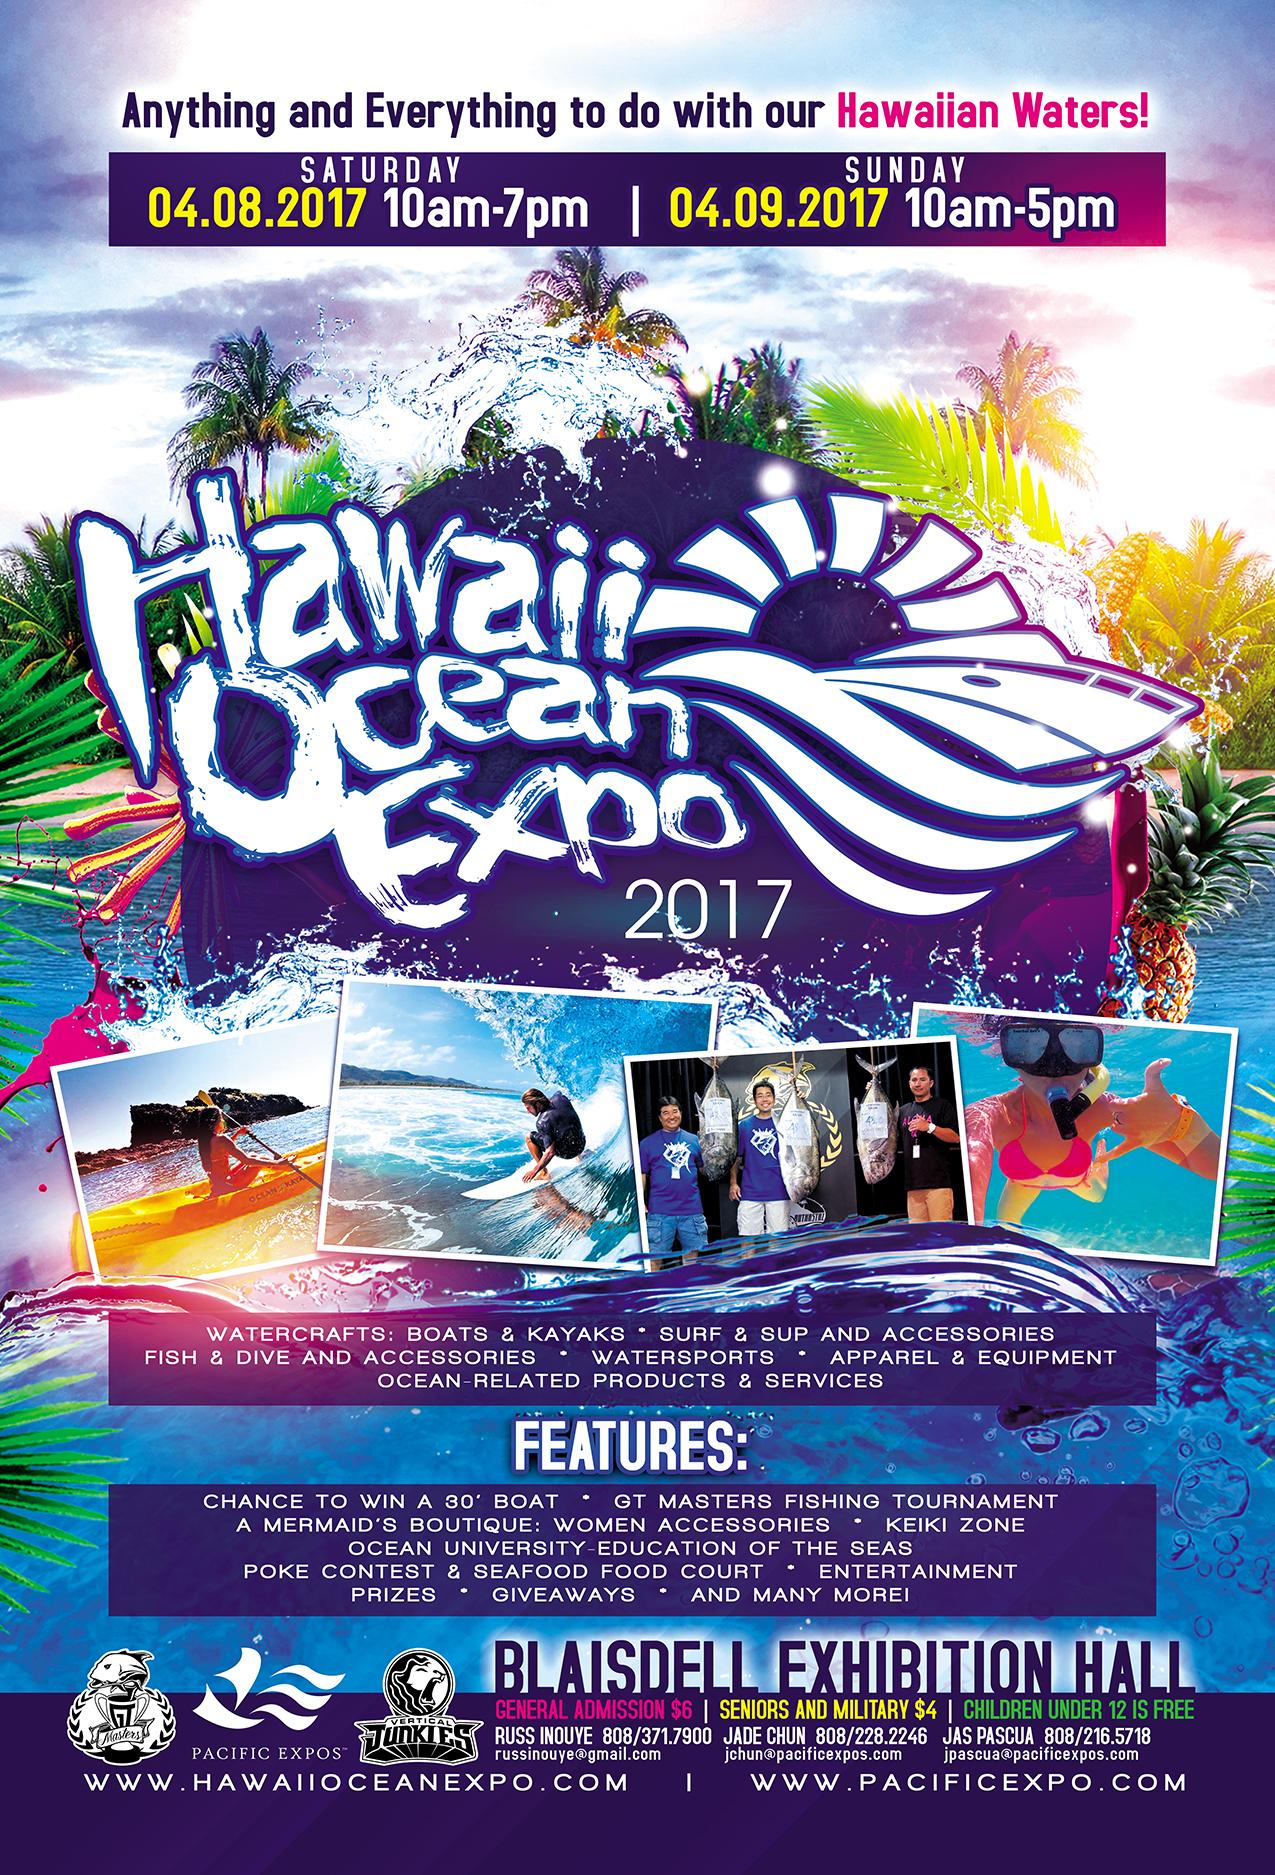 23946 - Hawaiioceanexpo Poster-KL-4x6